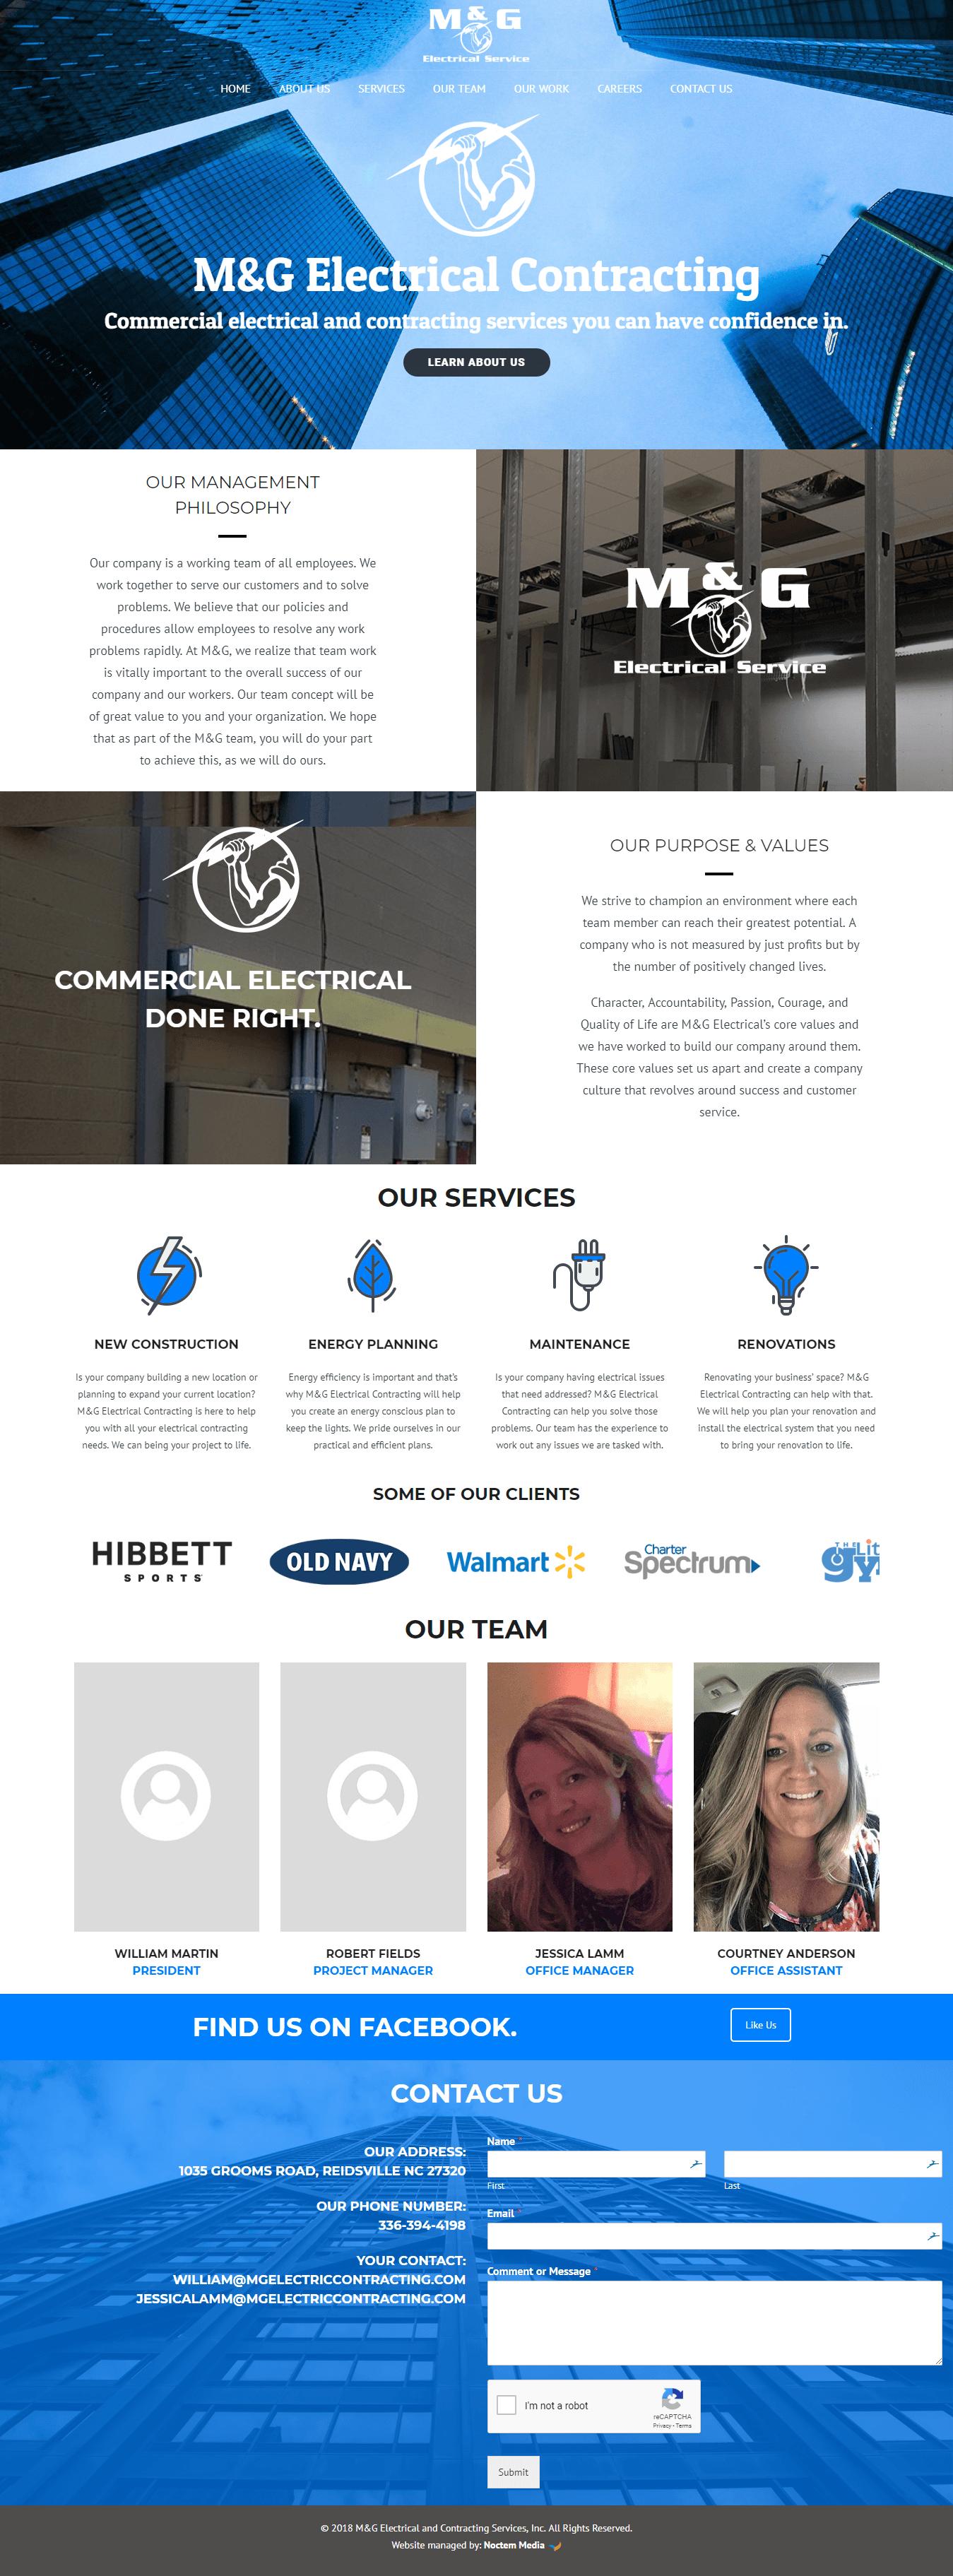 iMac with screenshot of M&G Electrical Company's website designed by Greensboro website design company Noctem Media.